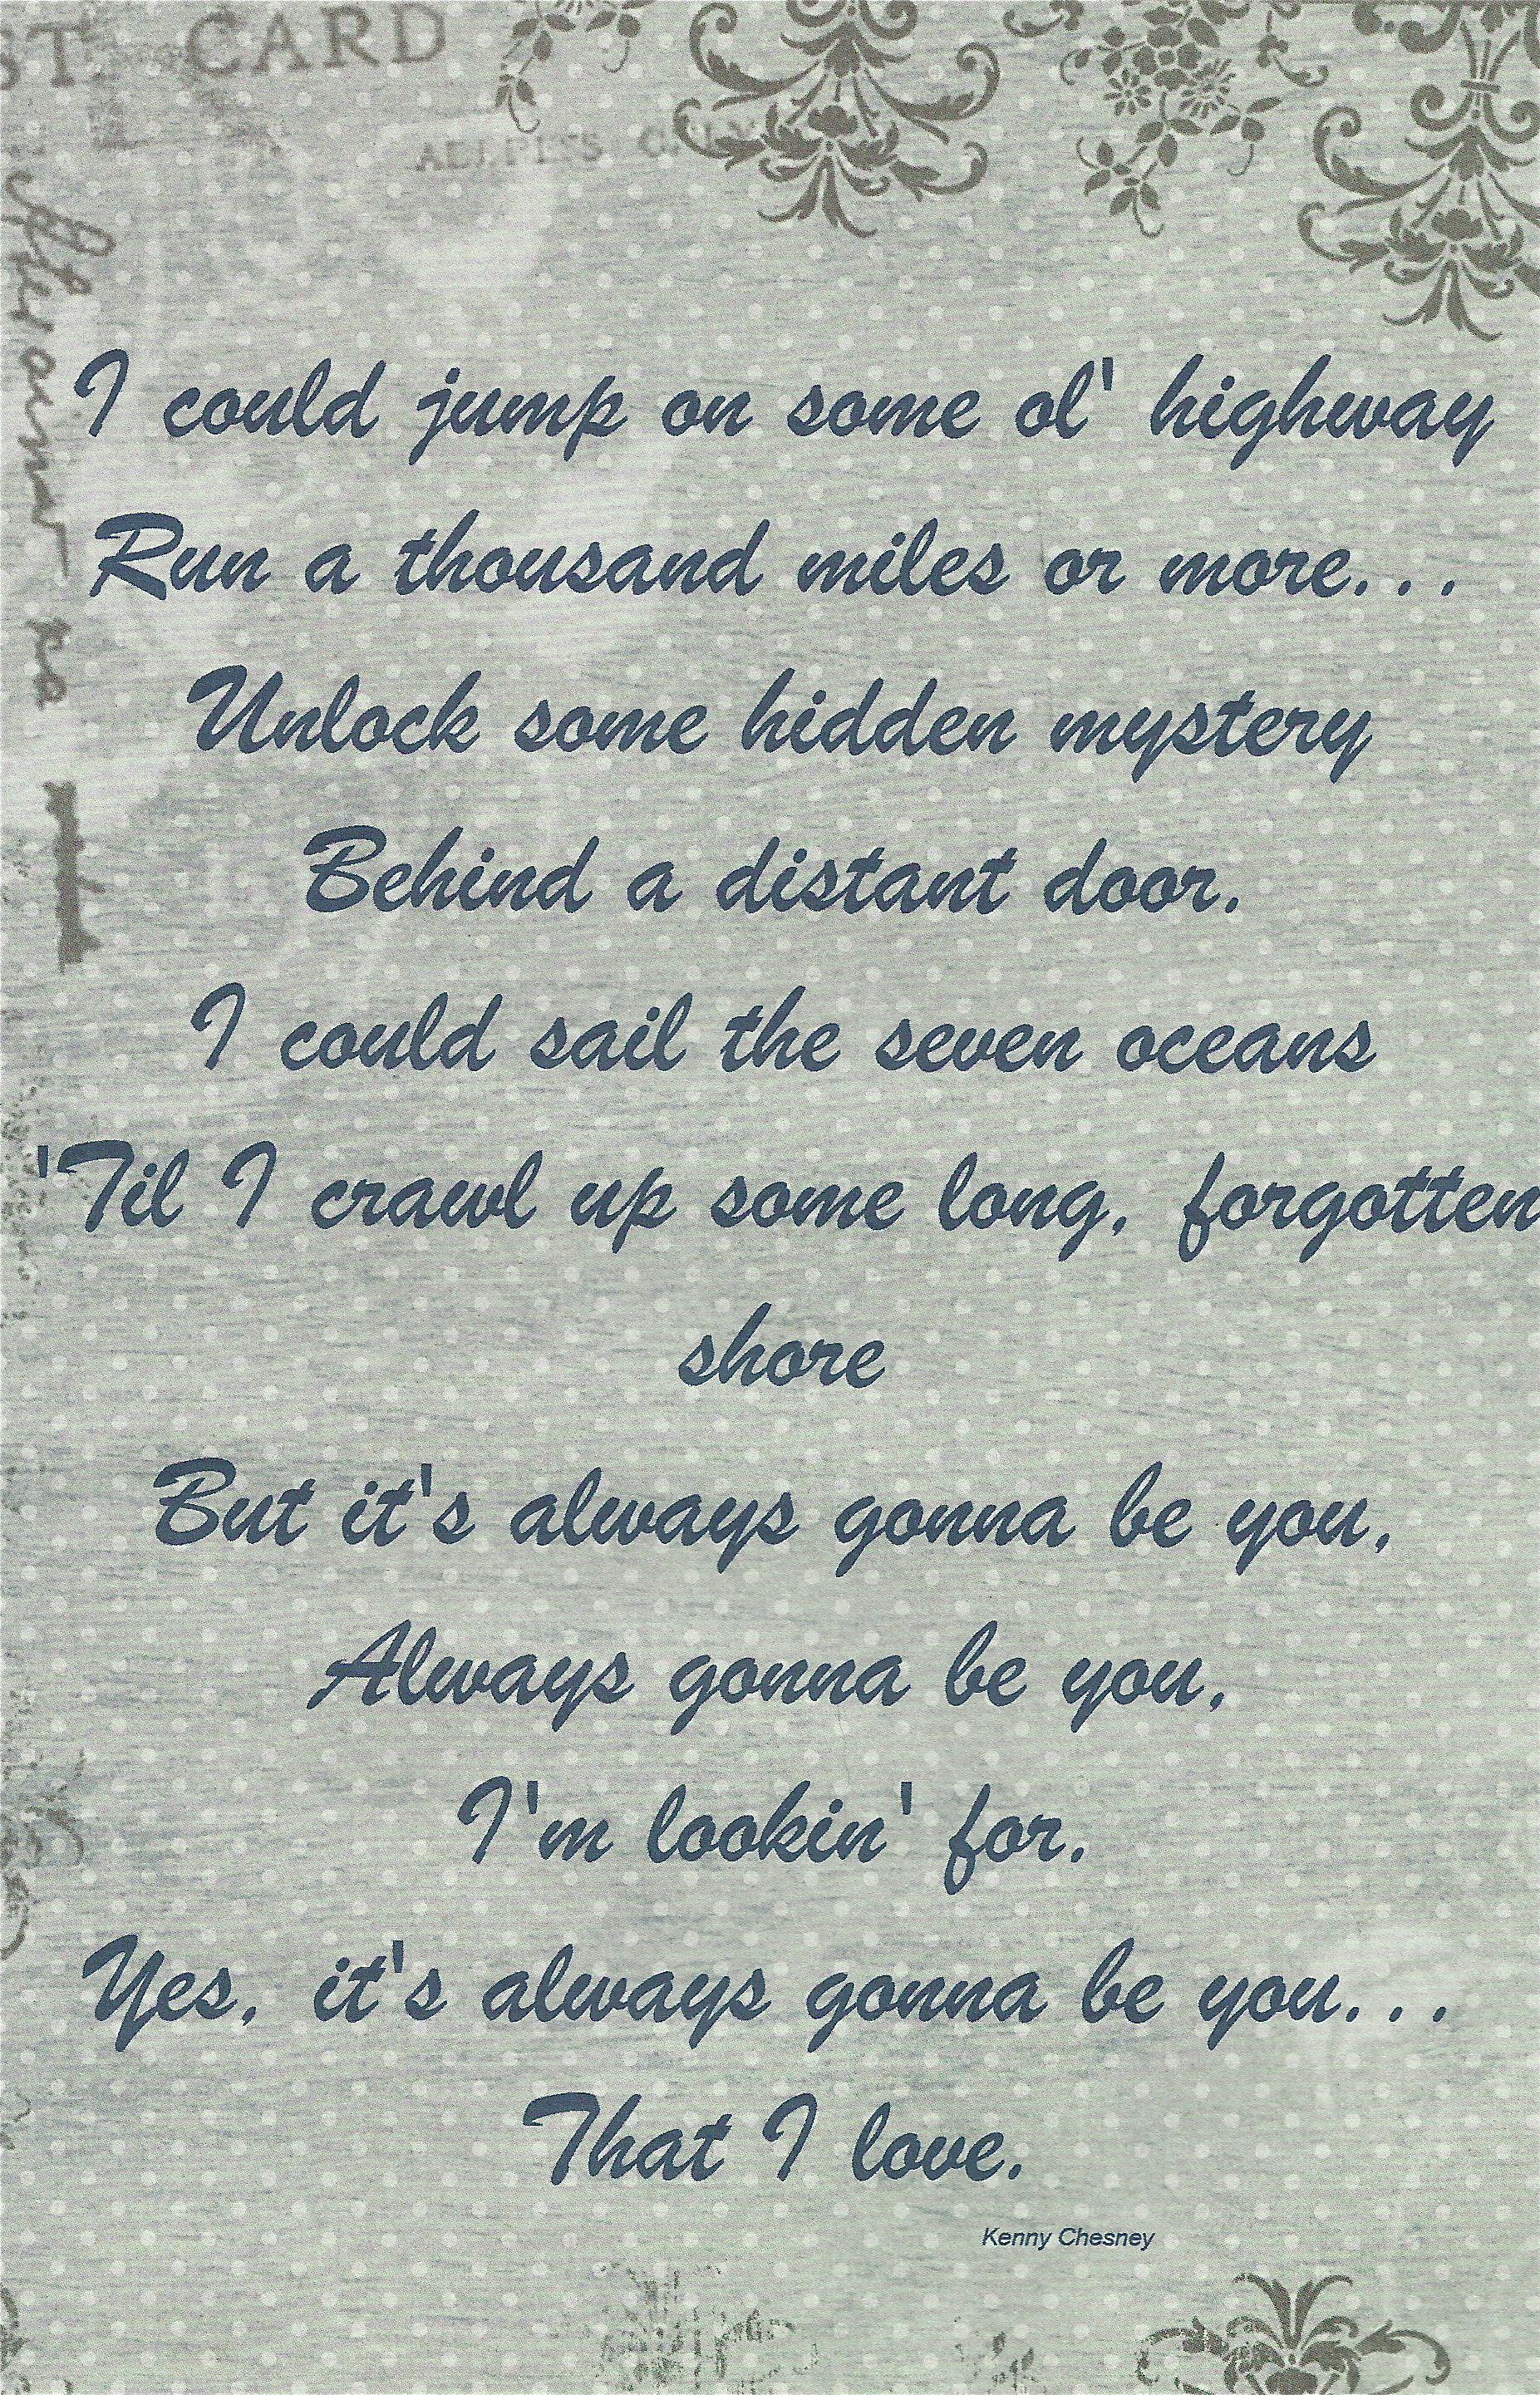 To my precious family...